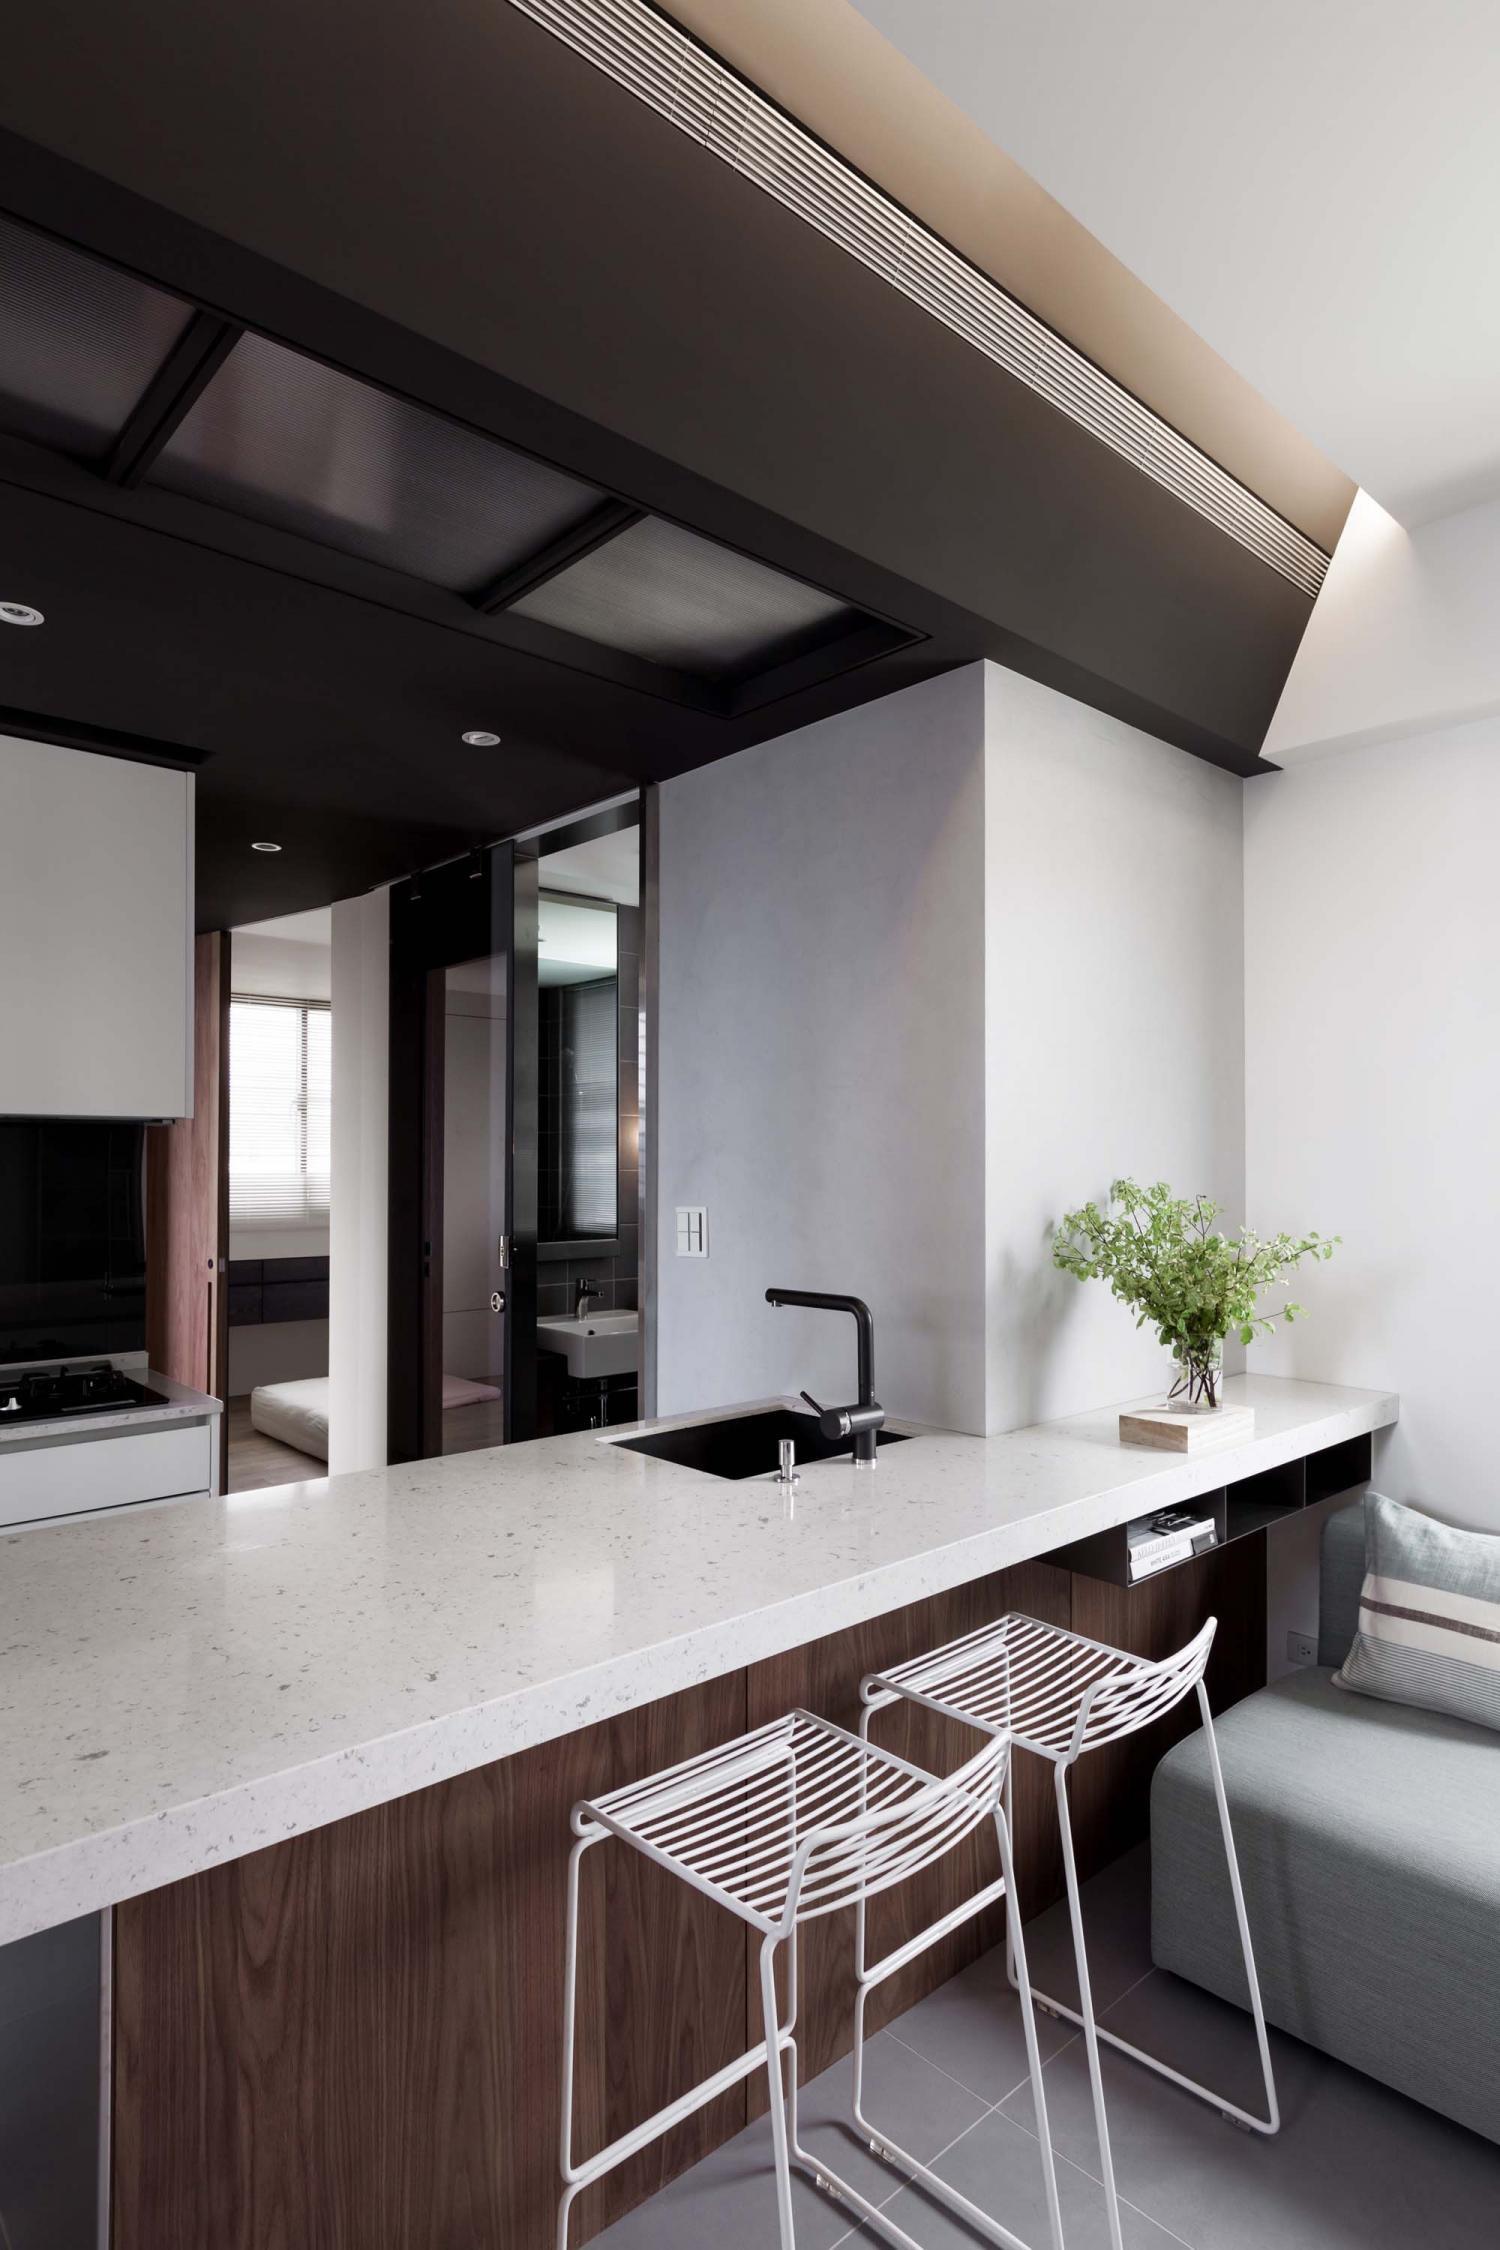 Interior Image 204